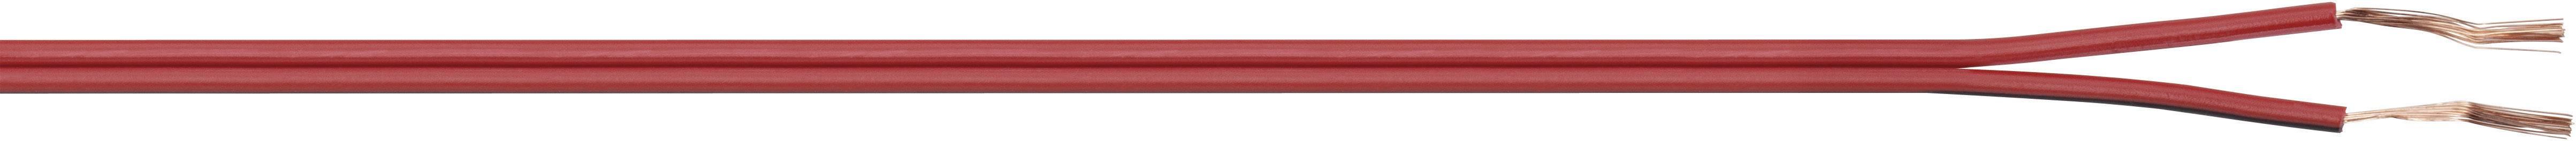 Opletenie / lanko LiY-Z LappKabel LiY-Z, 2 x 0.38 mm², červená, červenočierna, metrový tovar